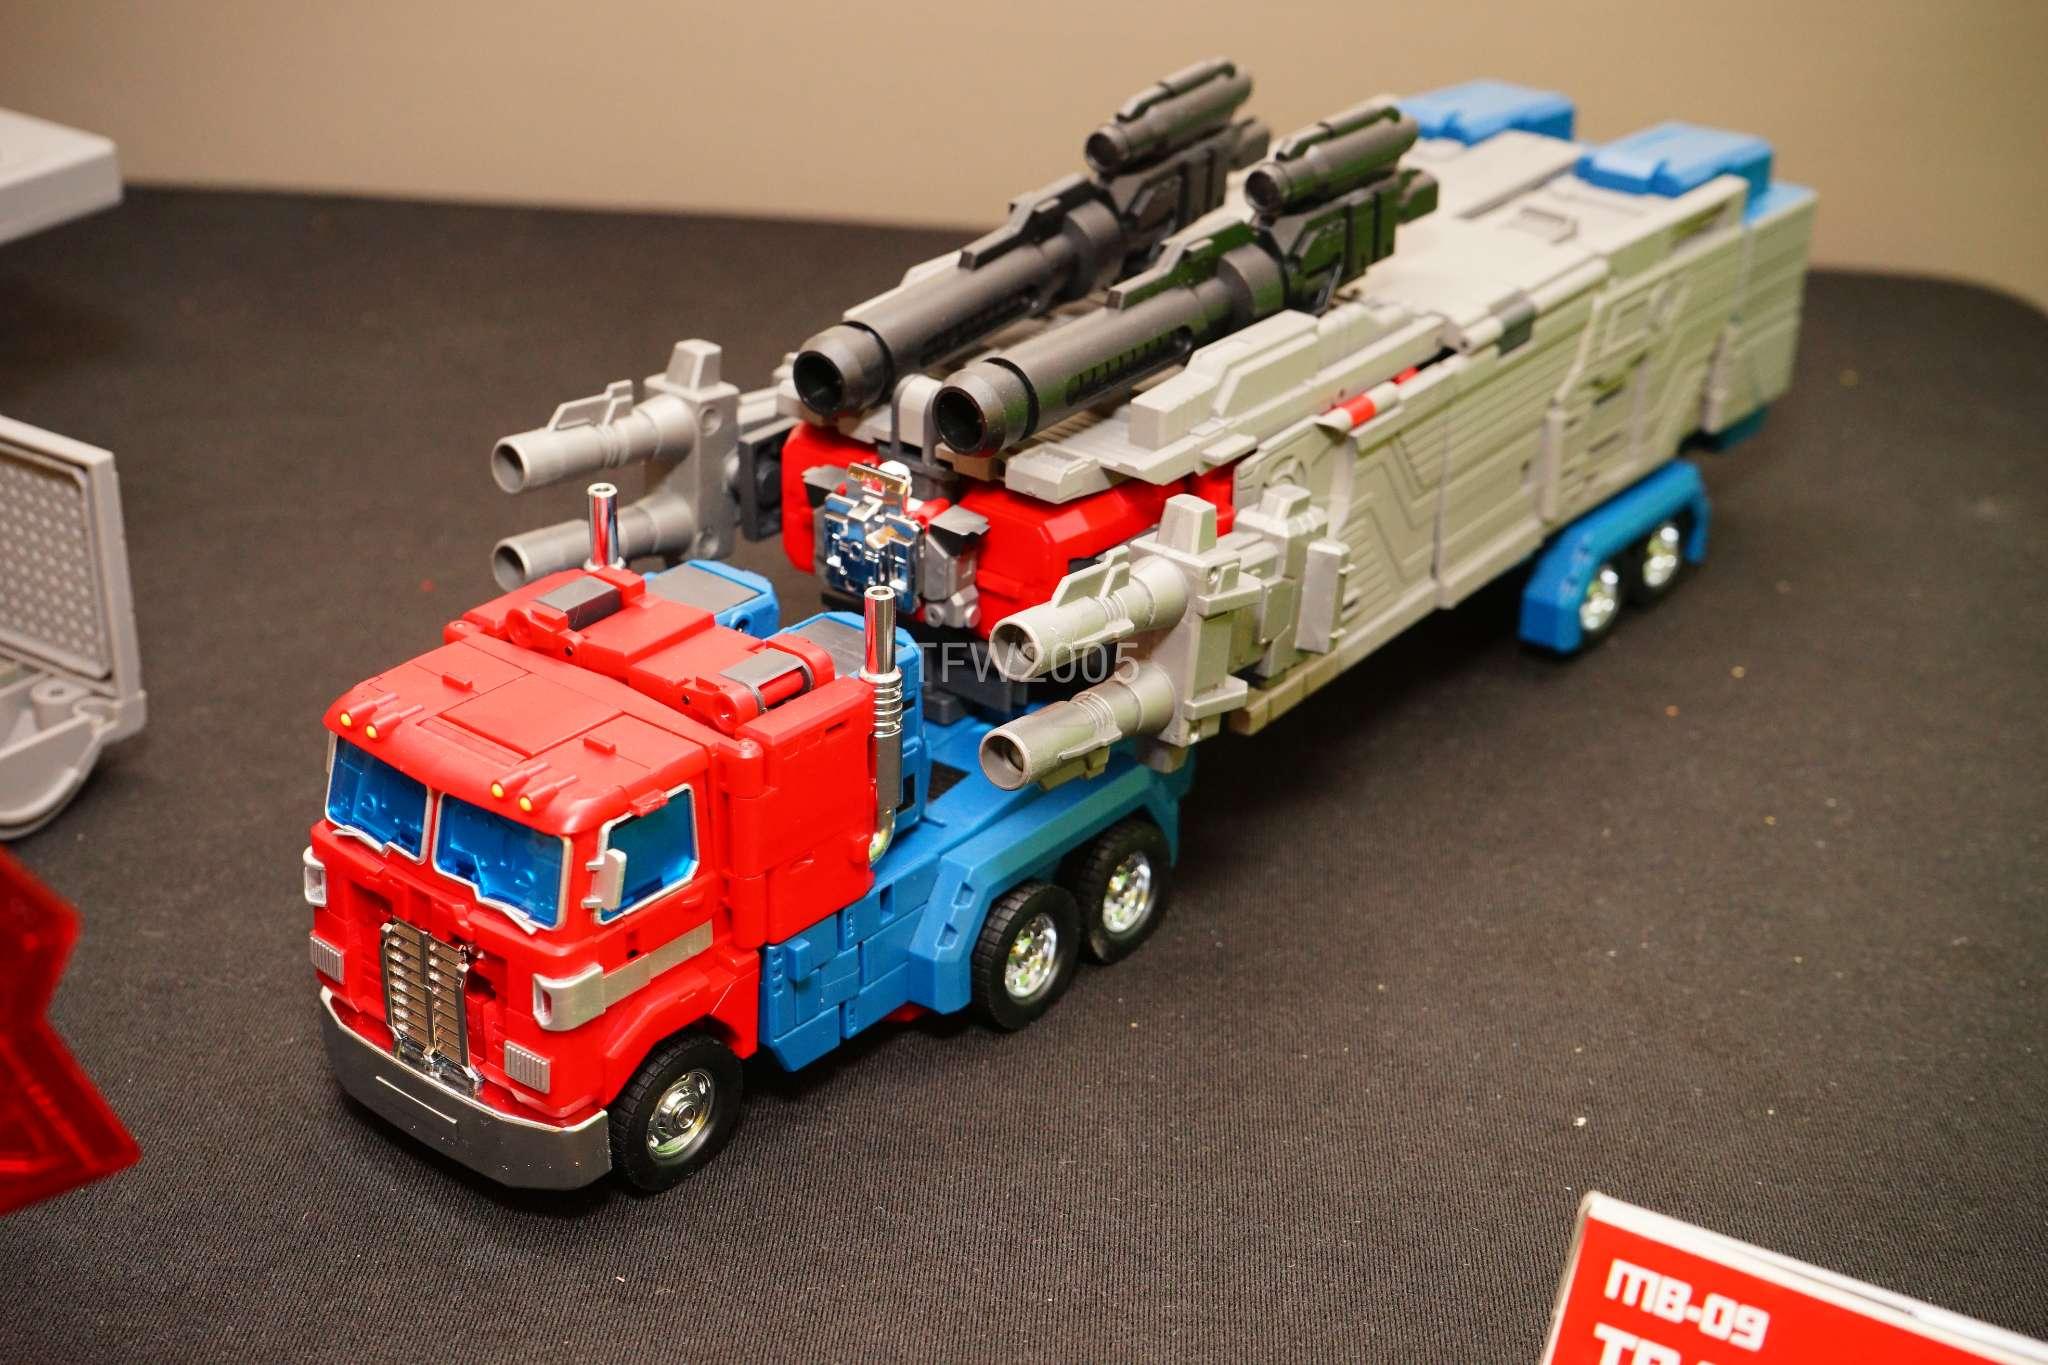 [FansHobby] Produit Tiers - MB-06 Power Baser (aka Powermaster Optimus) + MB-11 God Armour (aka Godbomber) - TF Masterforce - Page 2 EeKbJAUO_o